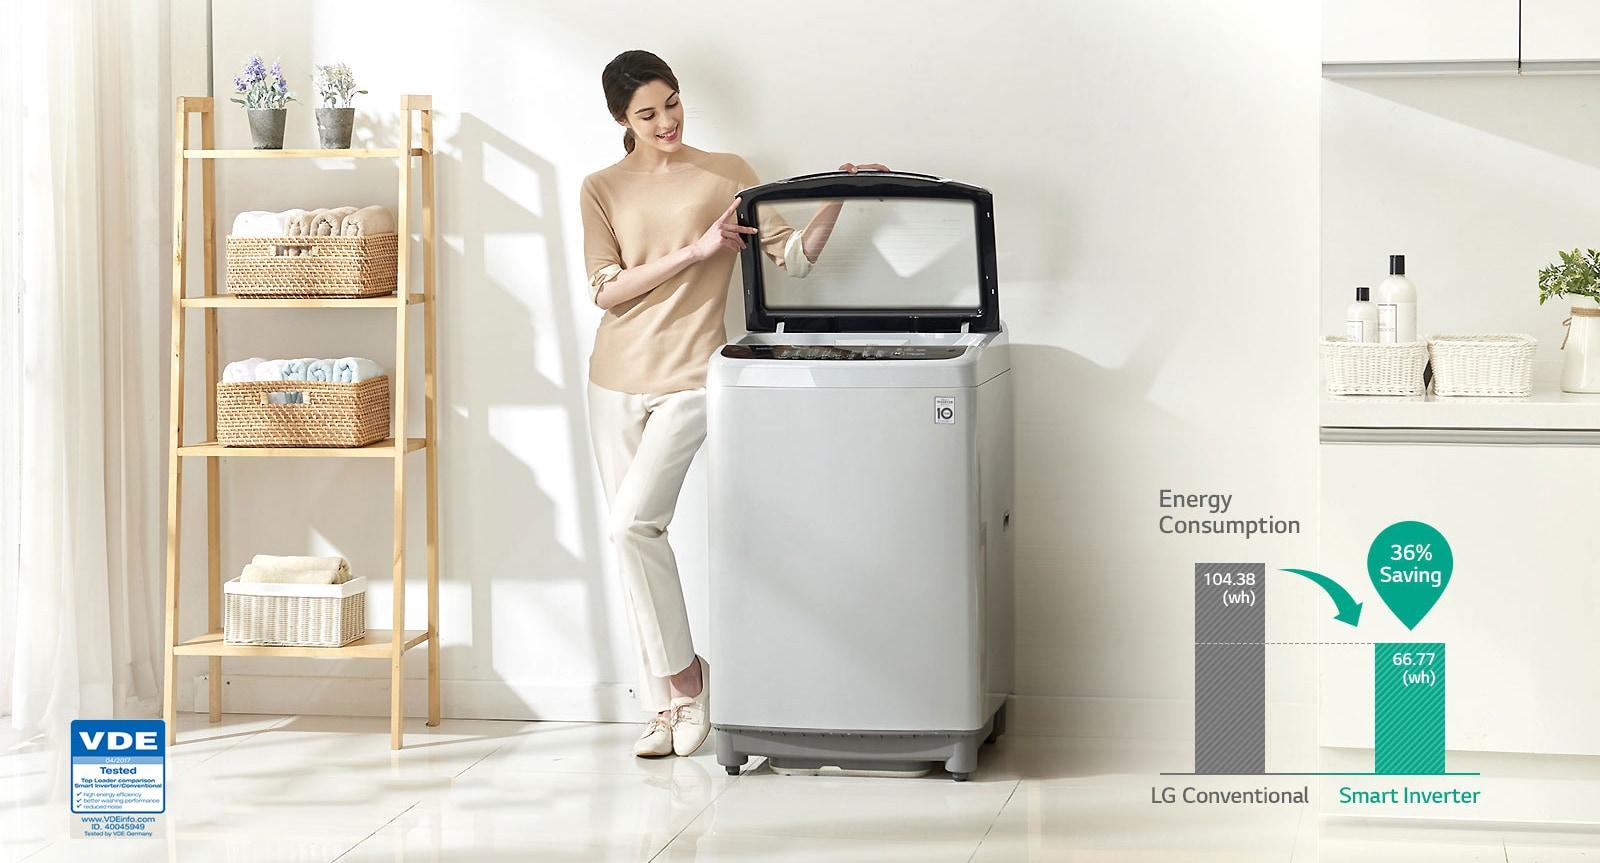 Energy Saving with Smart Inverter Control1